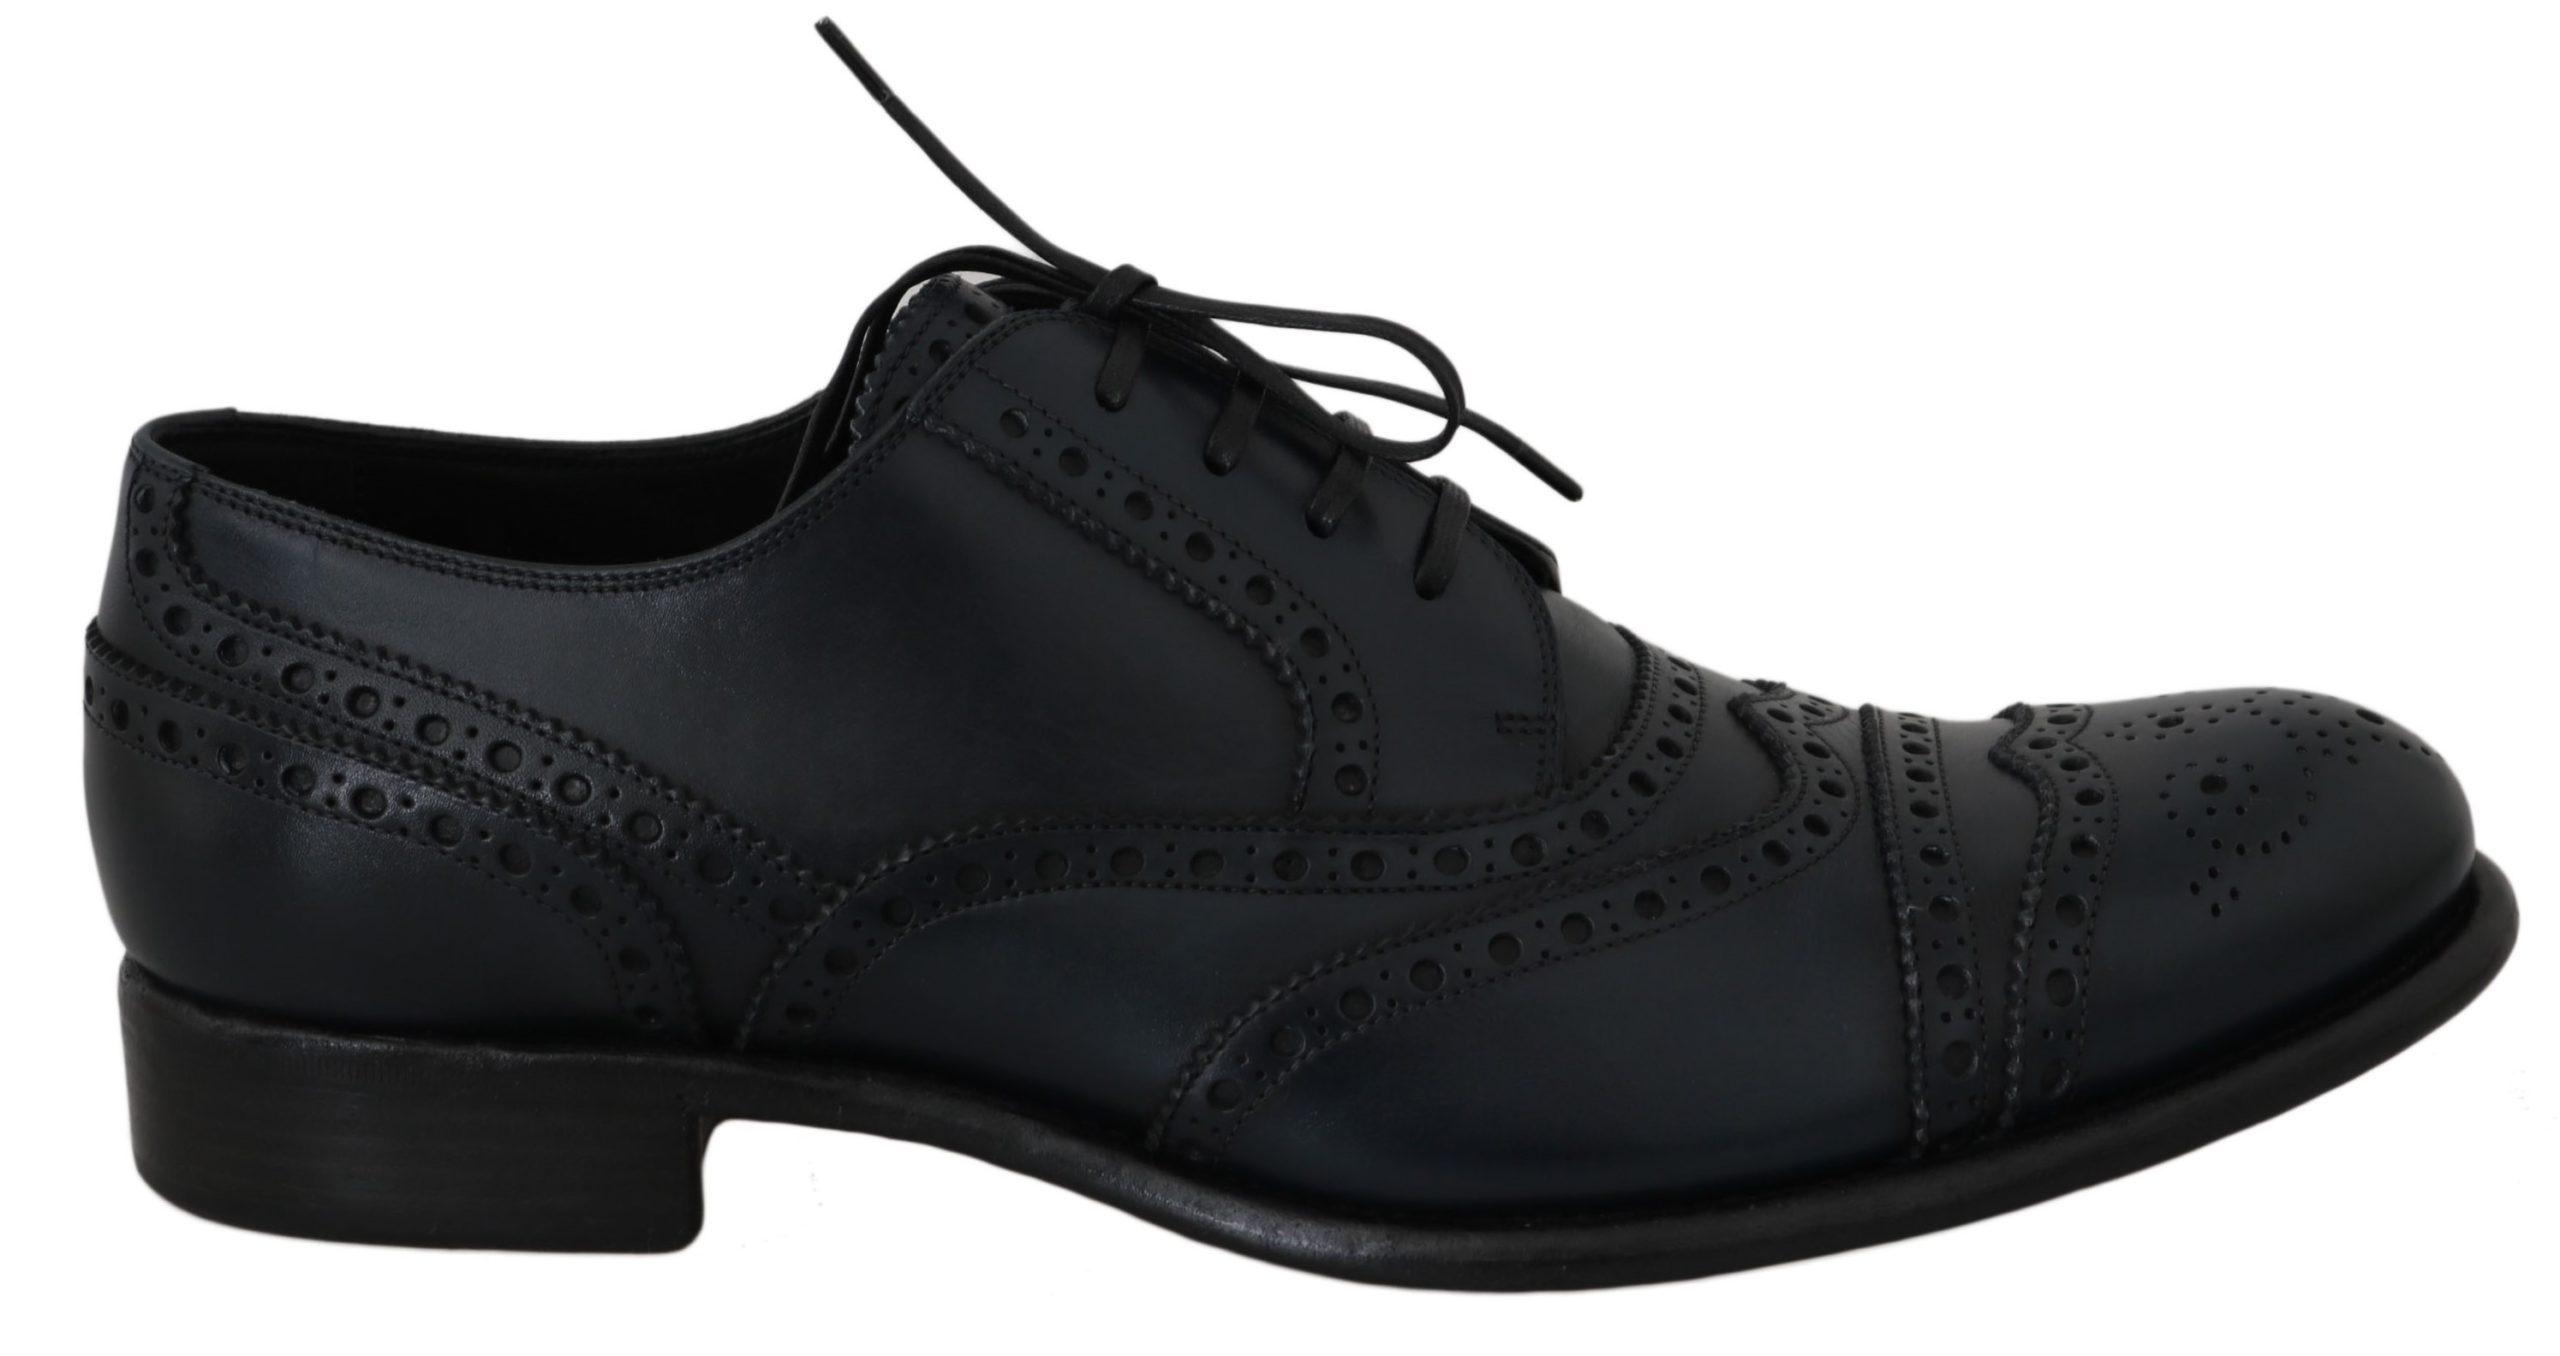 Dolce & Gabbana Men's Leather Wingtip Oxford Shoes Blue MV2362 - EU39/US6